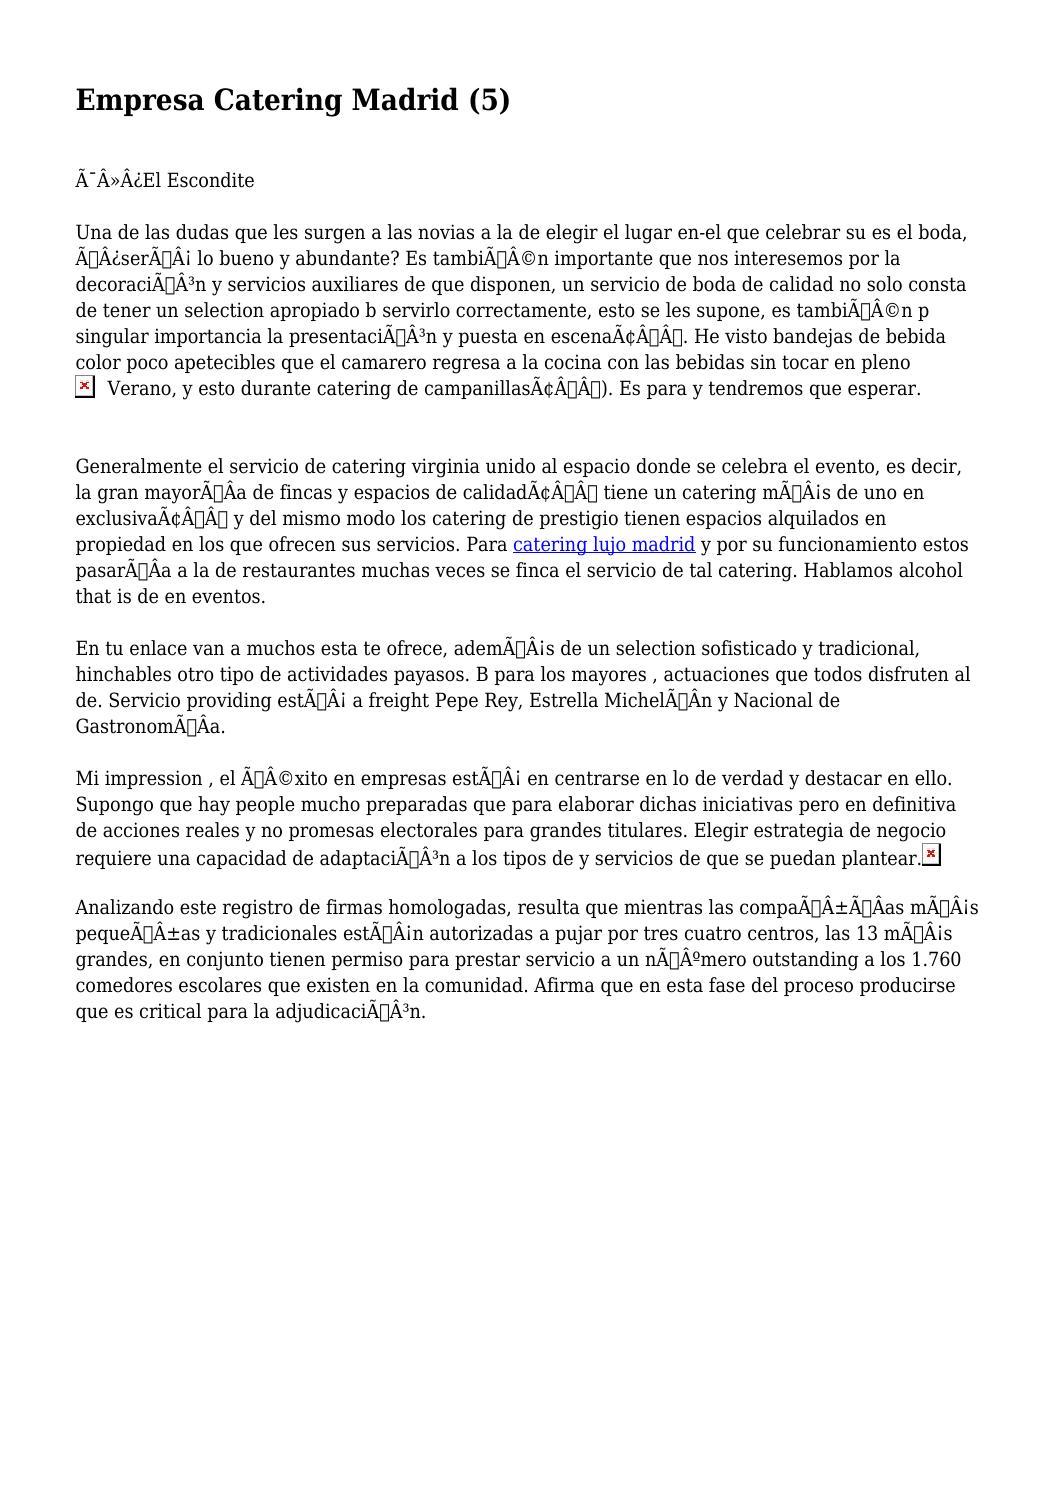 Empresa Catering Madrid (5) by ignorantalcove262 - issuu